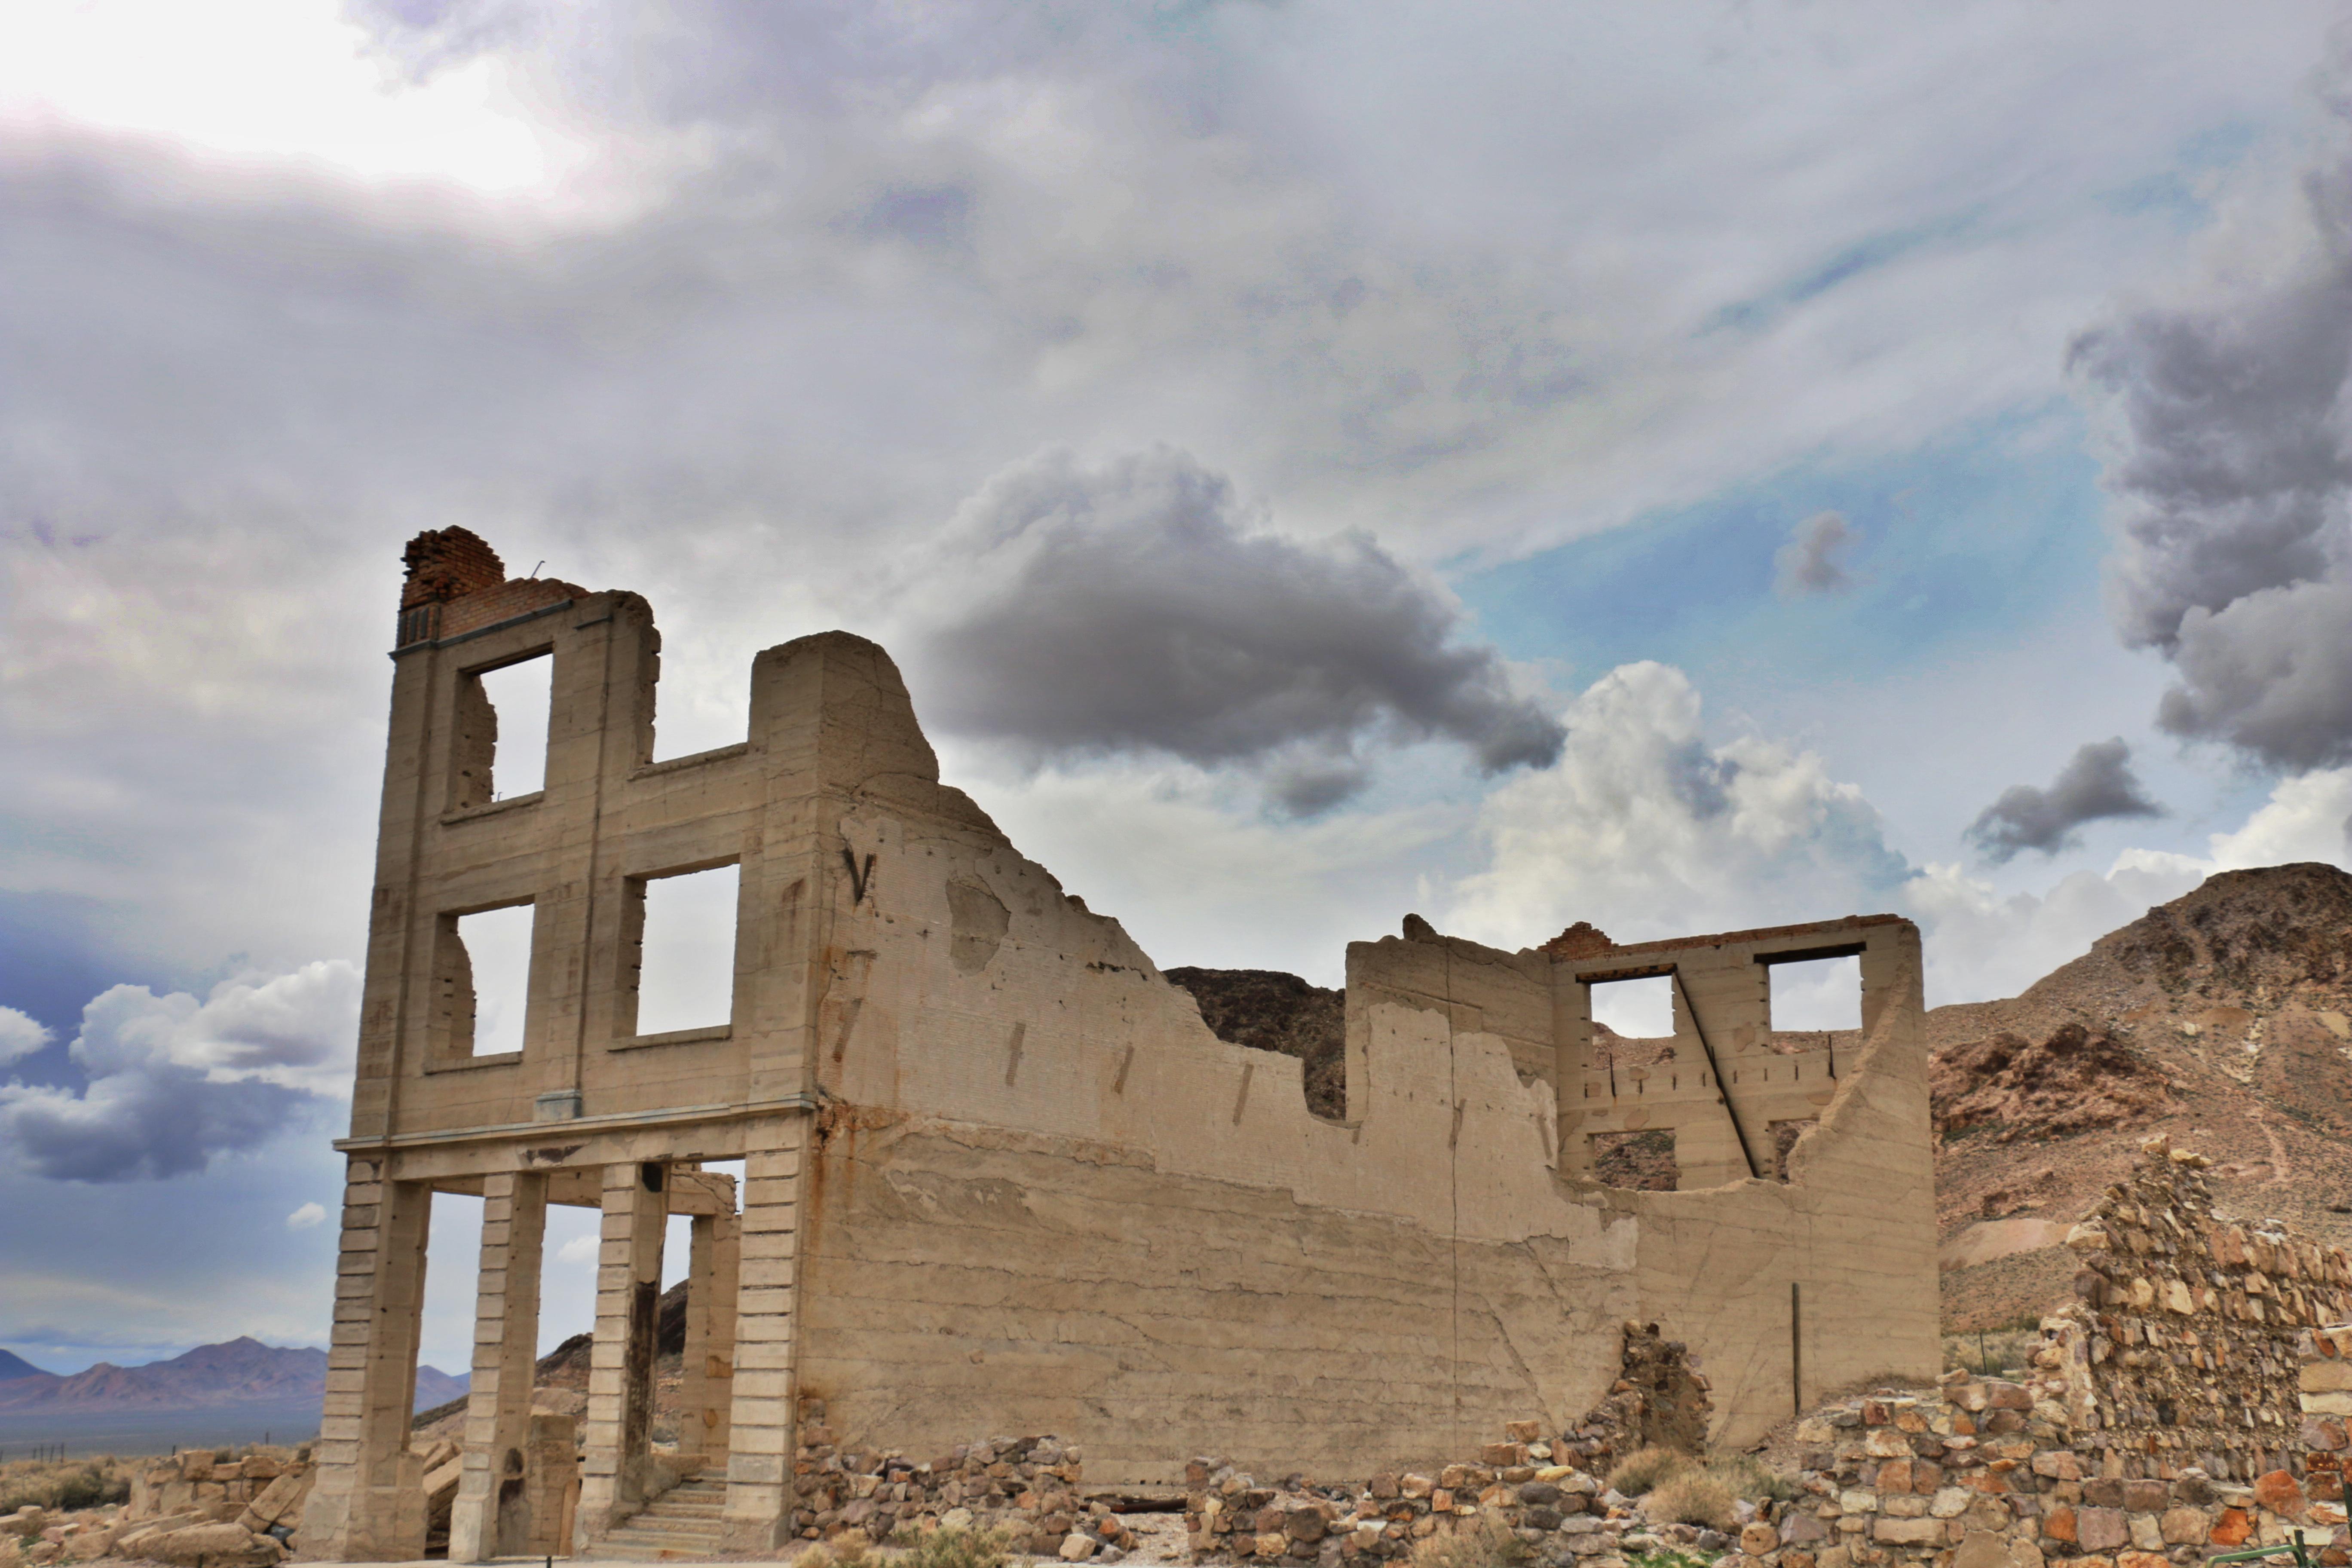 Day 10 – Rhyolite Ghost Town (Death Valley)